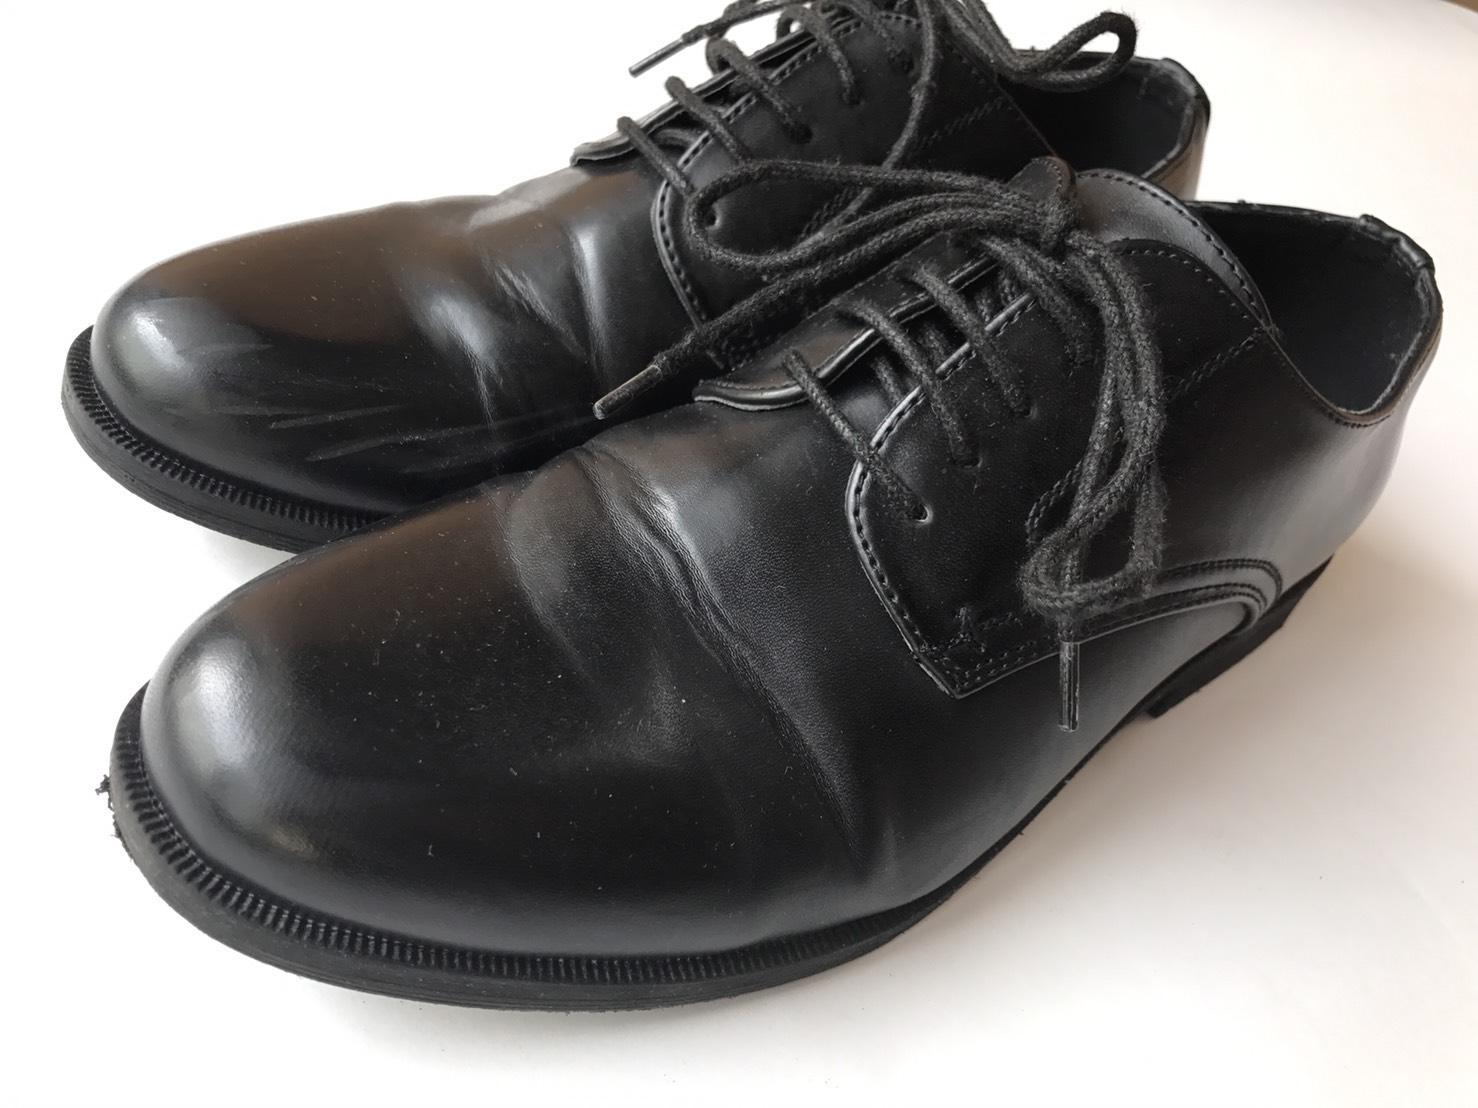 GU「ダービーシューズ」は革靴好きも認めるシルエット!2万円の革靴に見せる裏技も